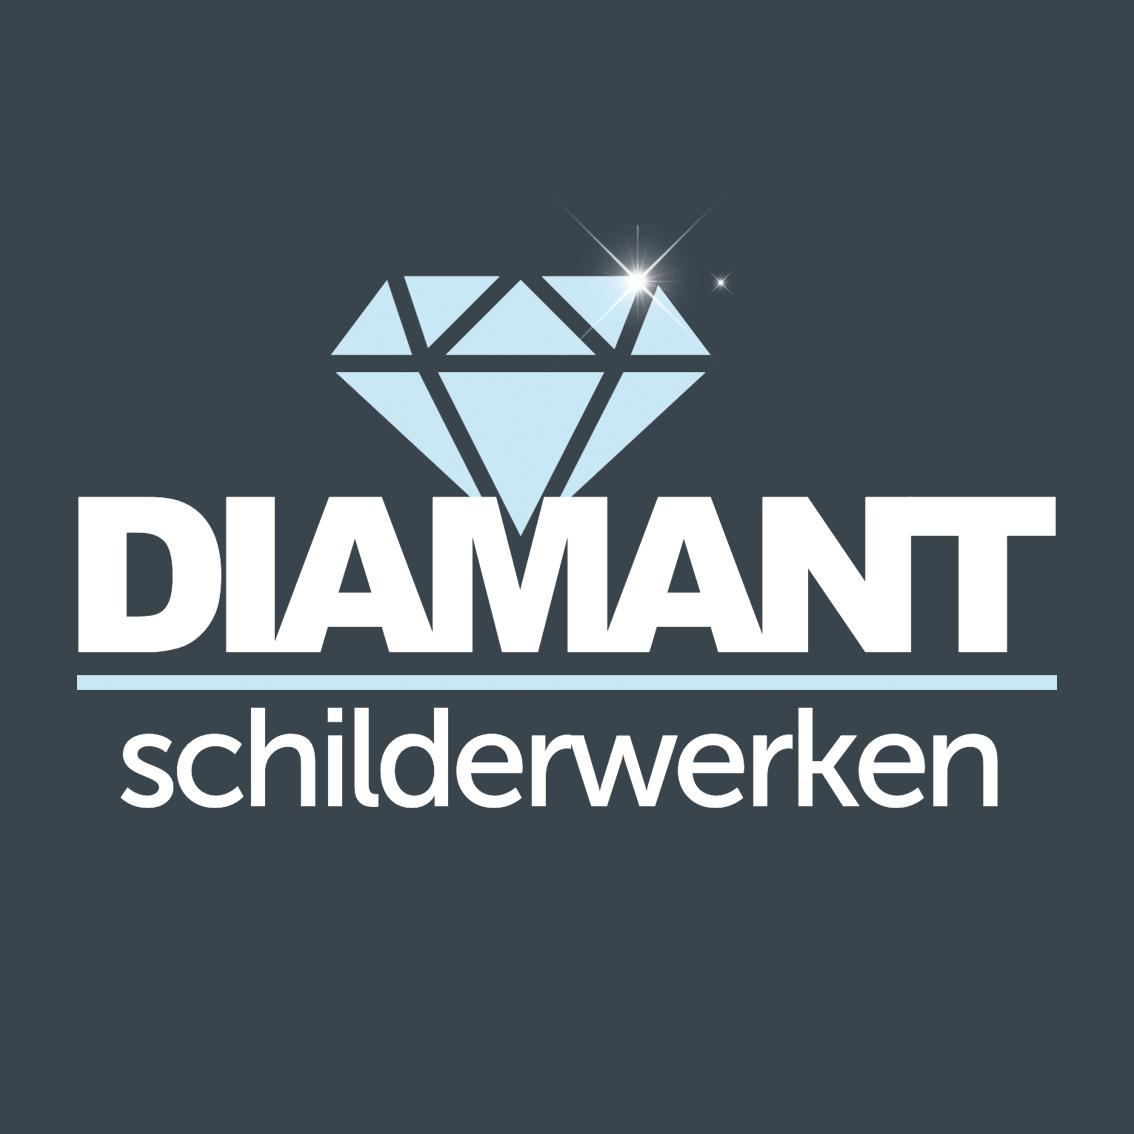 diamant-logo